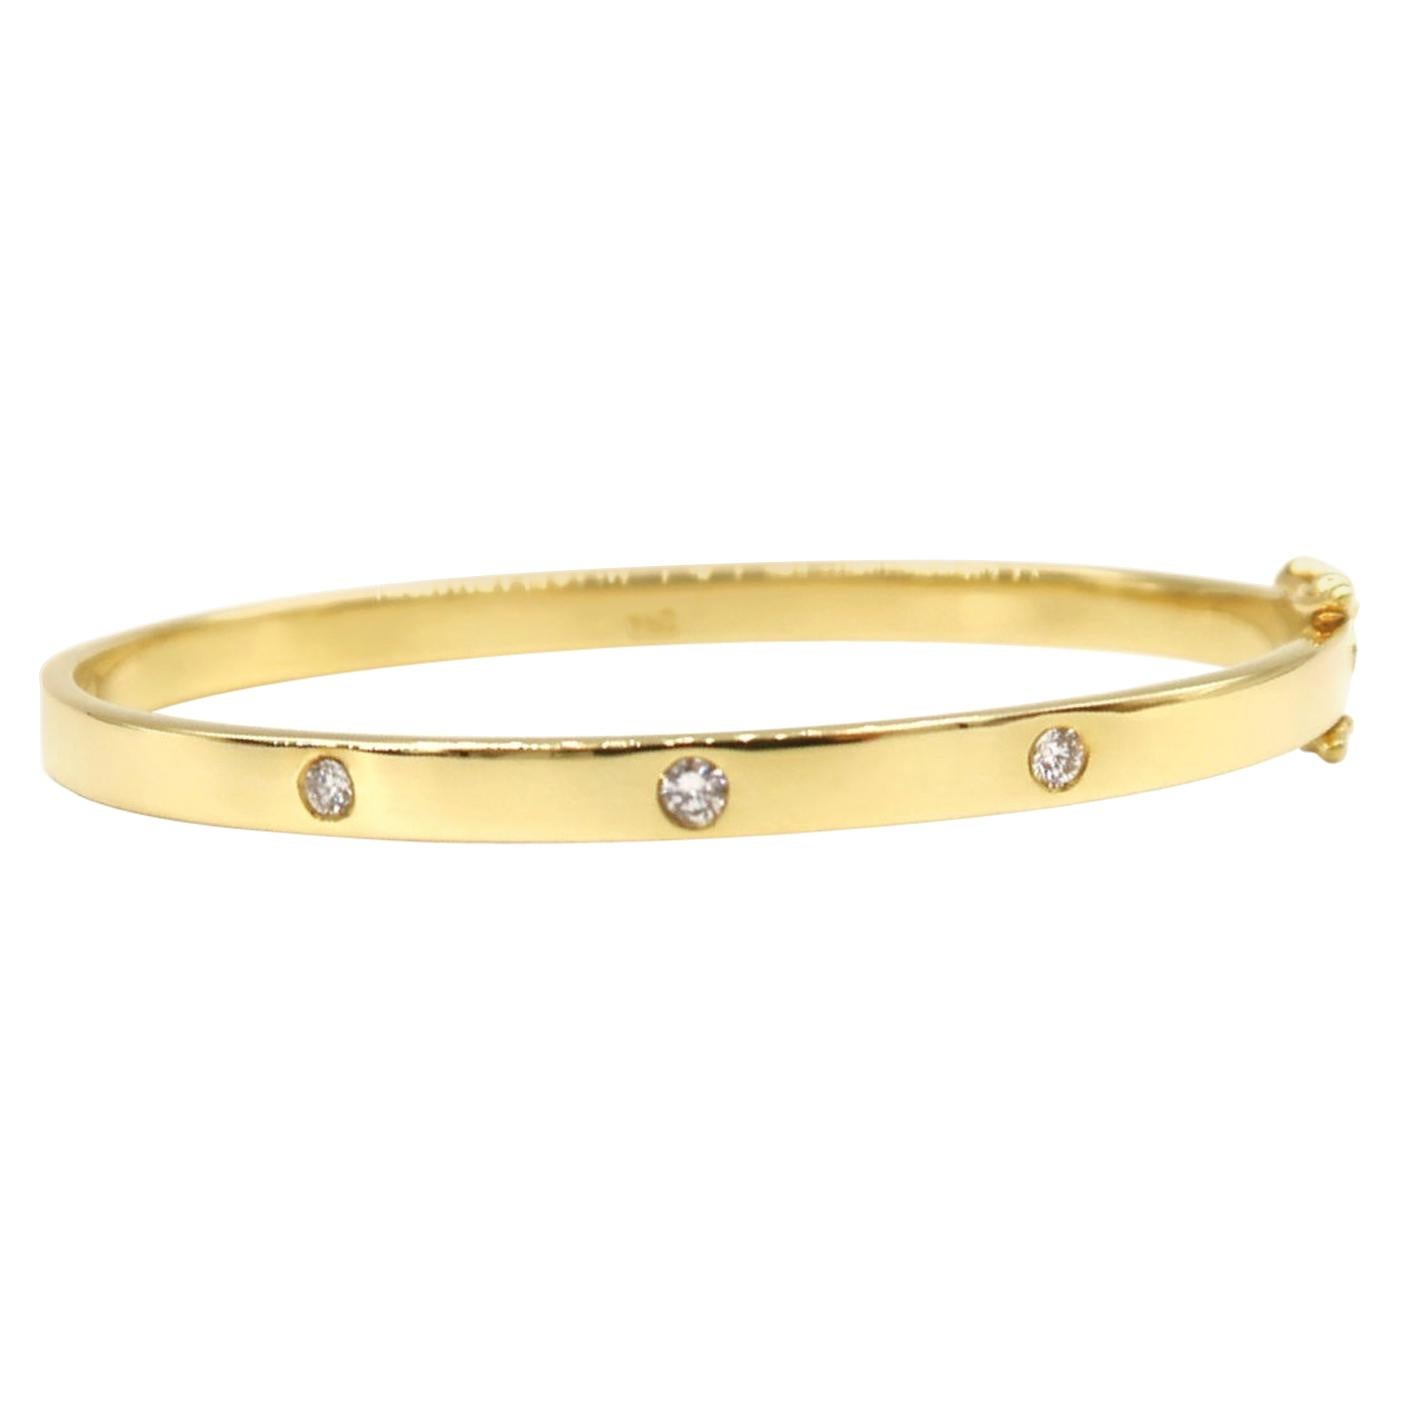 Stackable Three-Stone Diamond Flat Shiny Bangle in 18k Yellow Gold